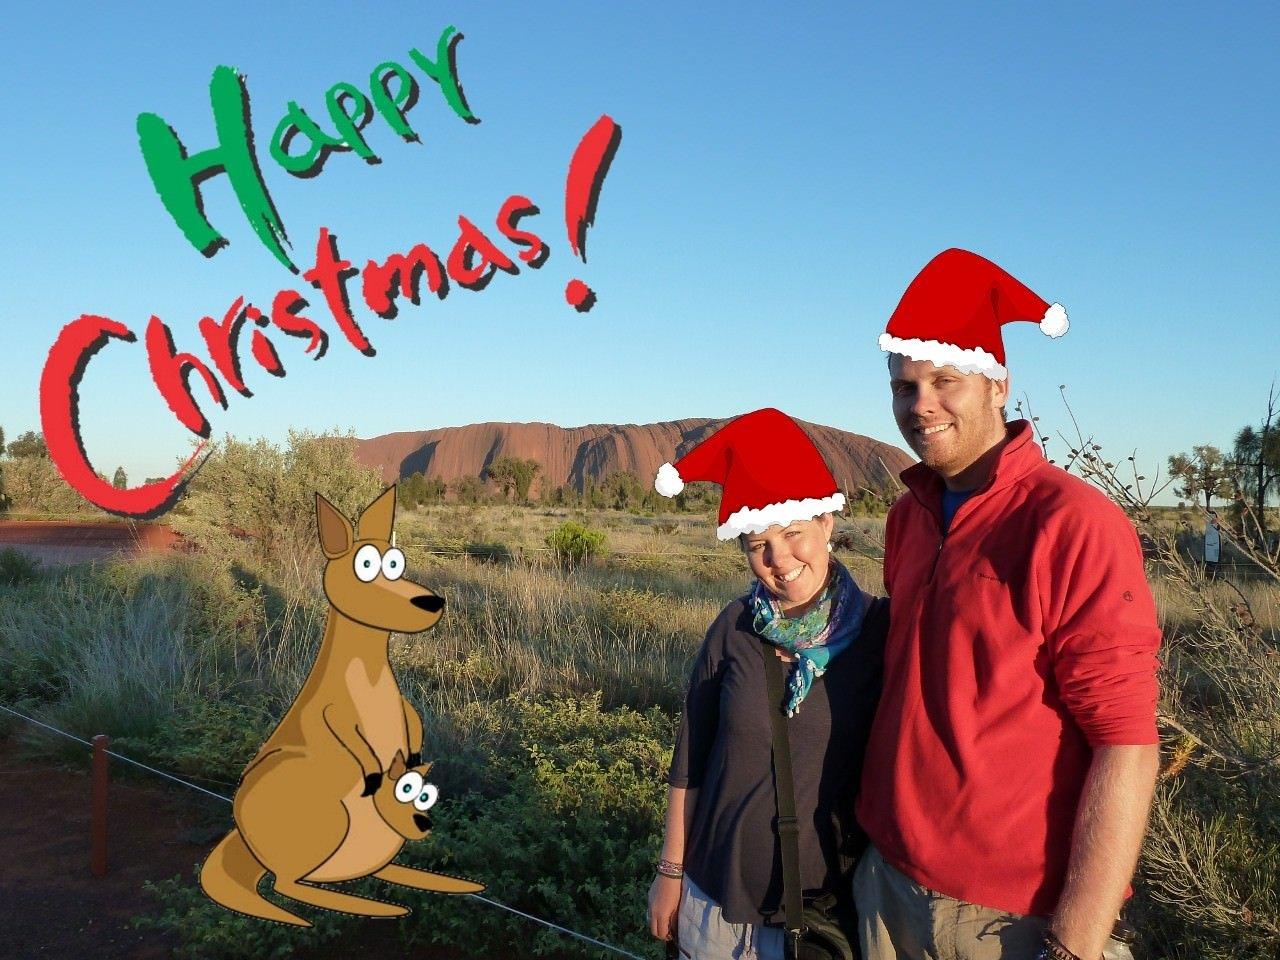 Happy Christmas from Australia